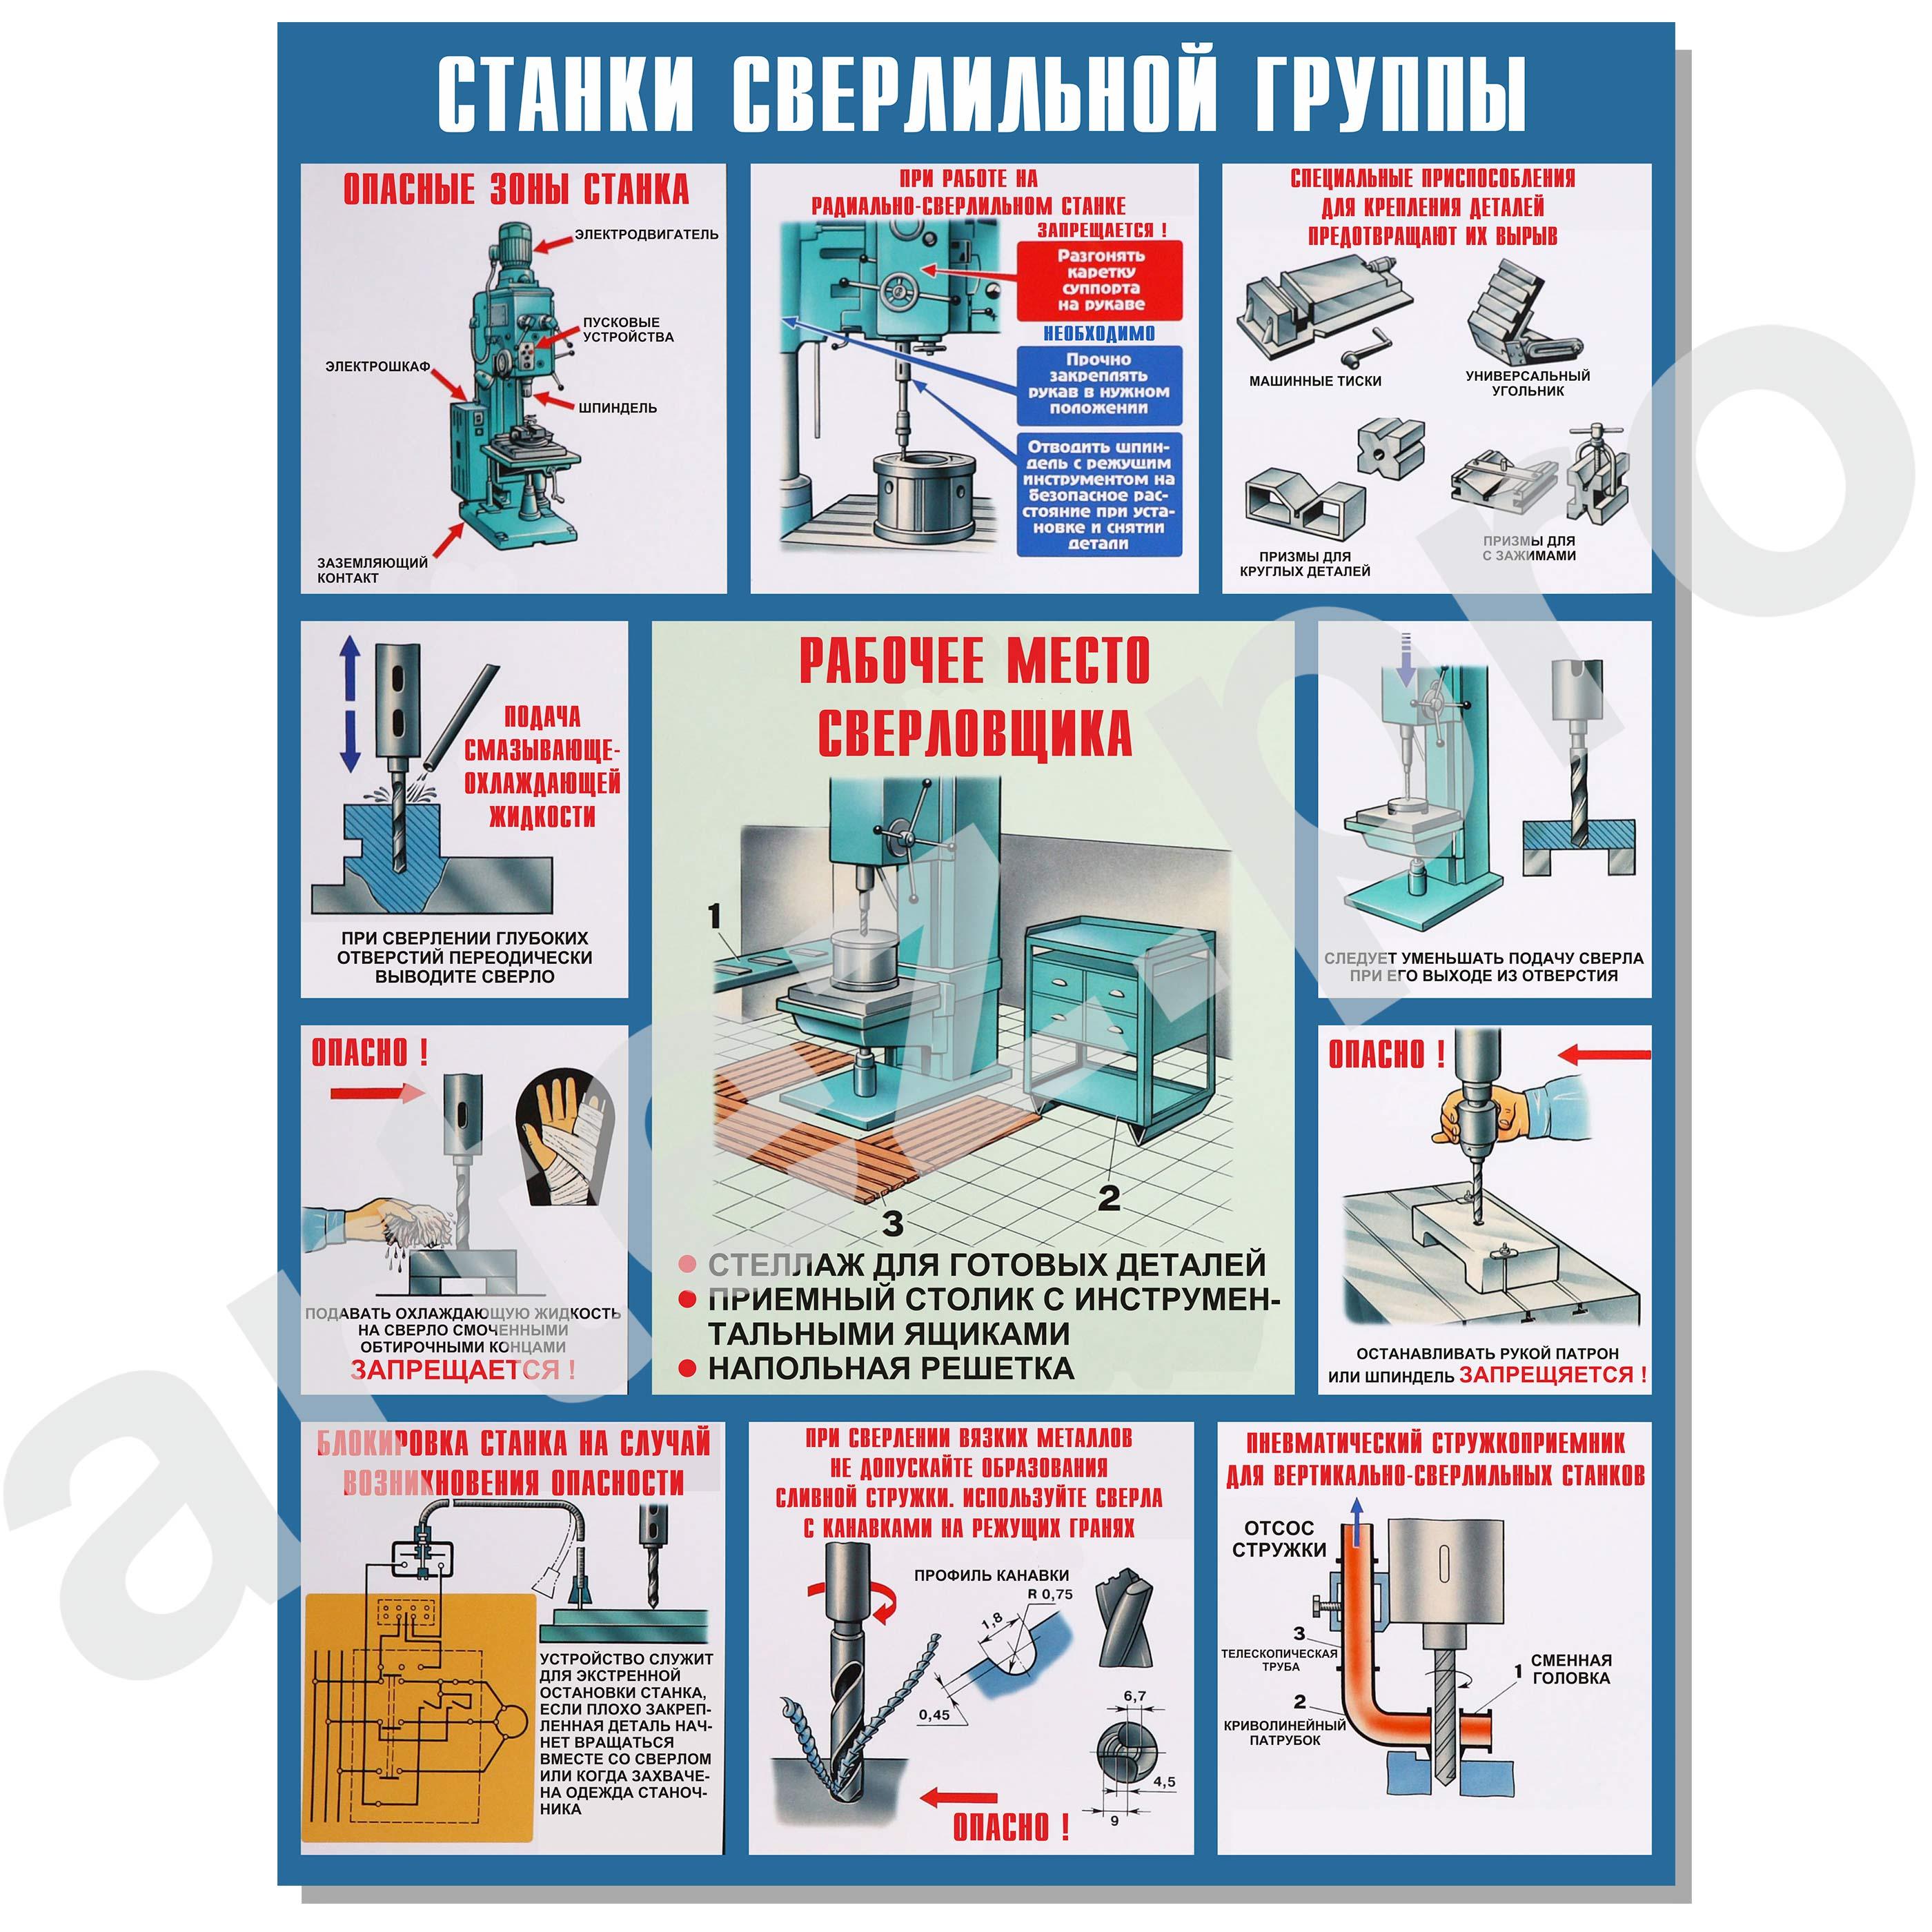 Инструкция по охране труда для токаря и техника безопасности